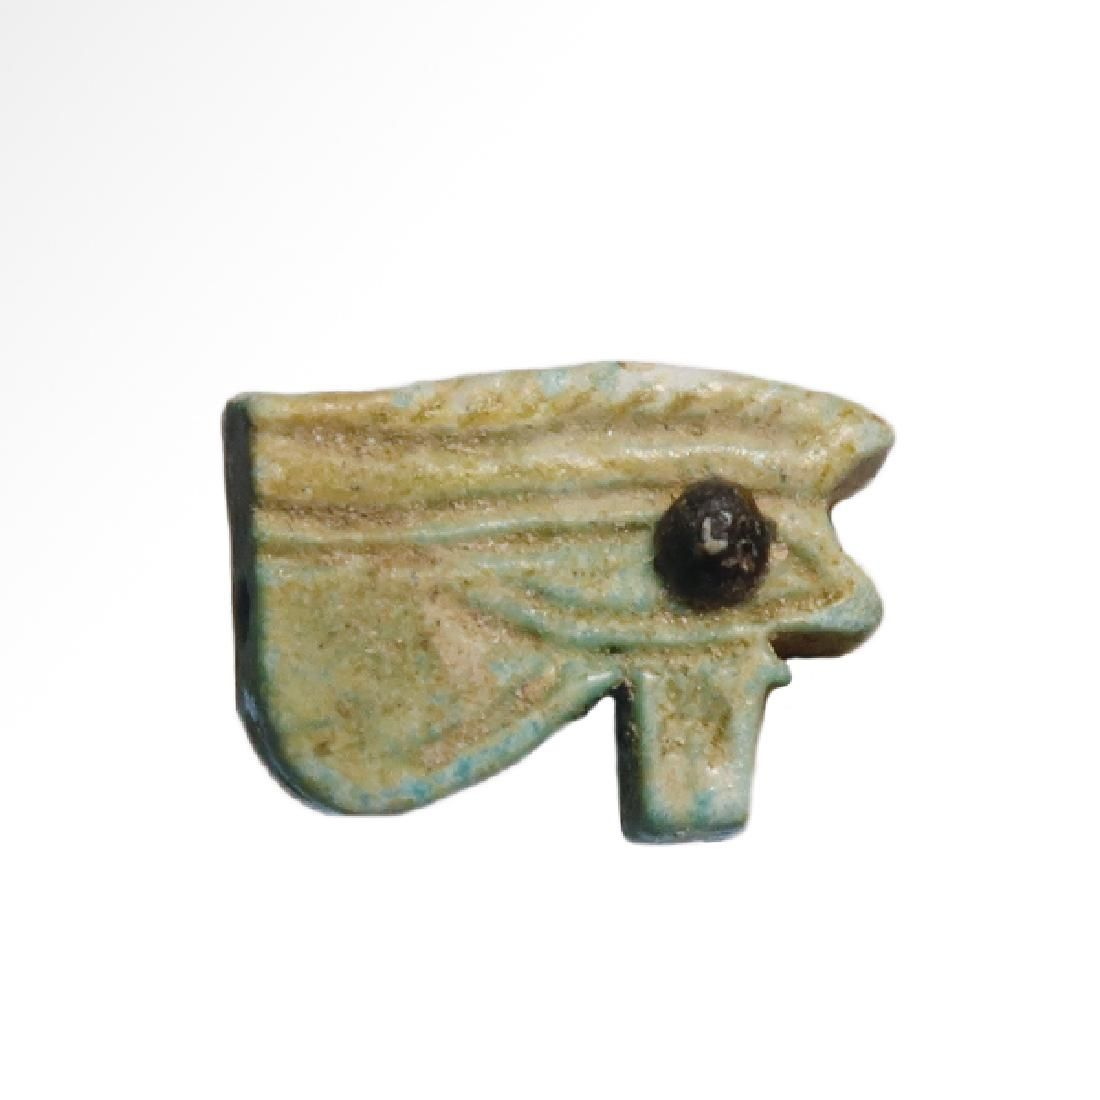 Egyptian Bichrome Blue and Black Faience Eye Amulet,